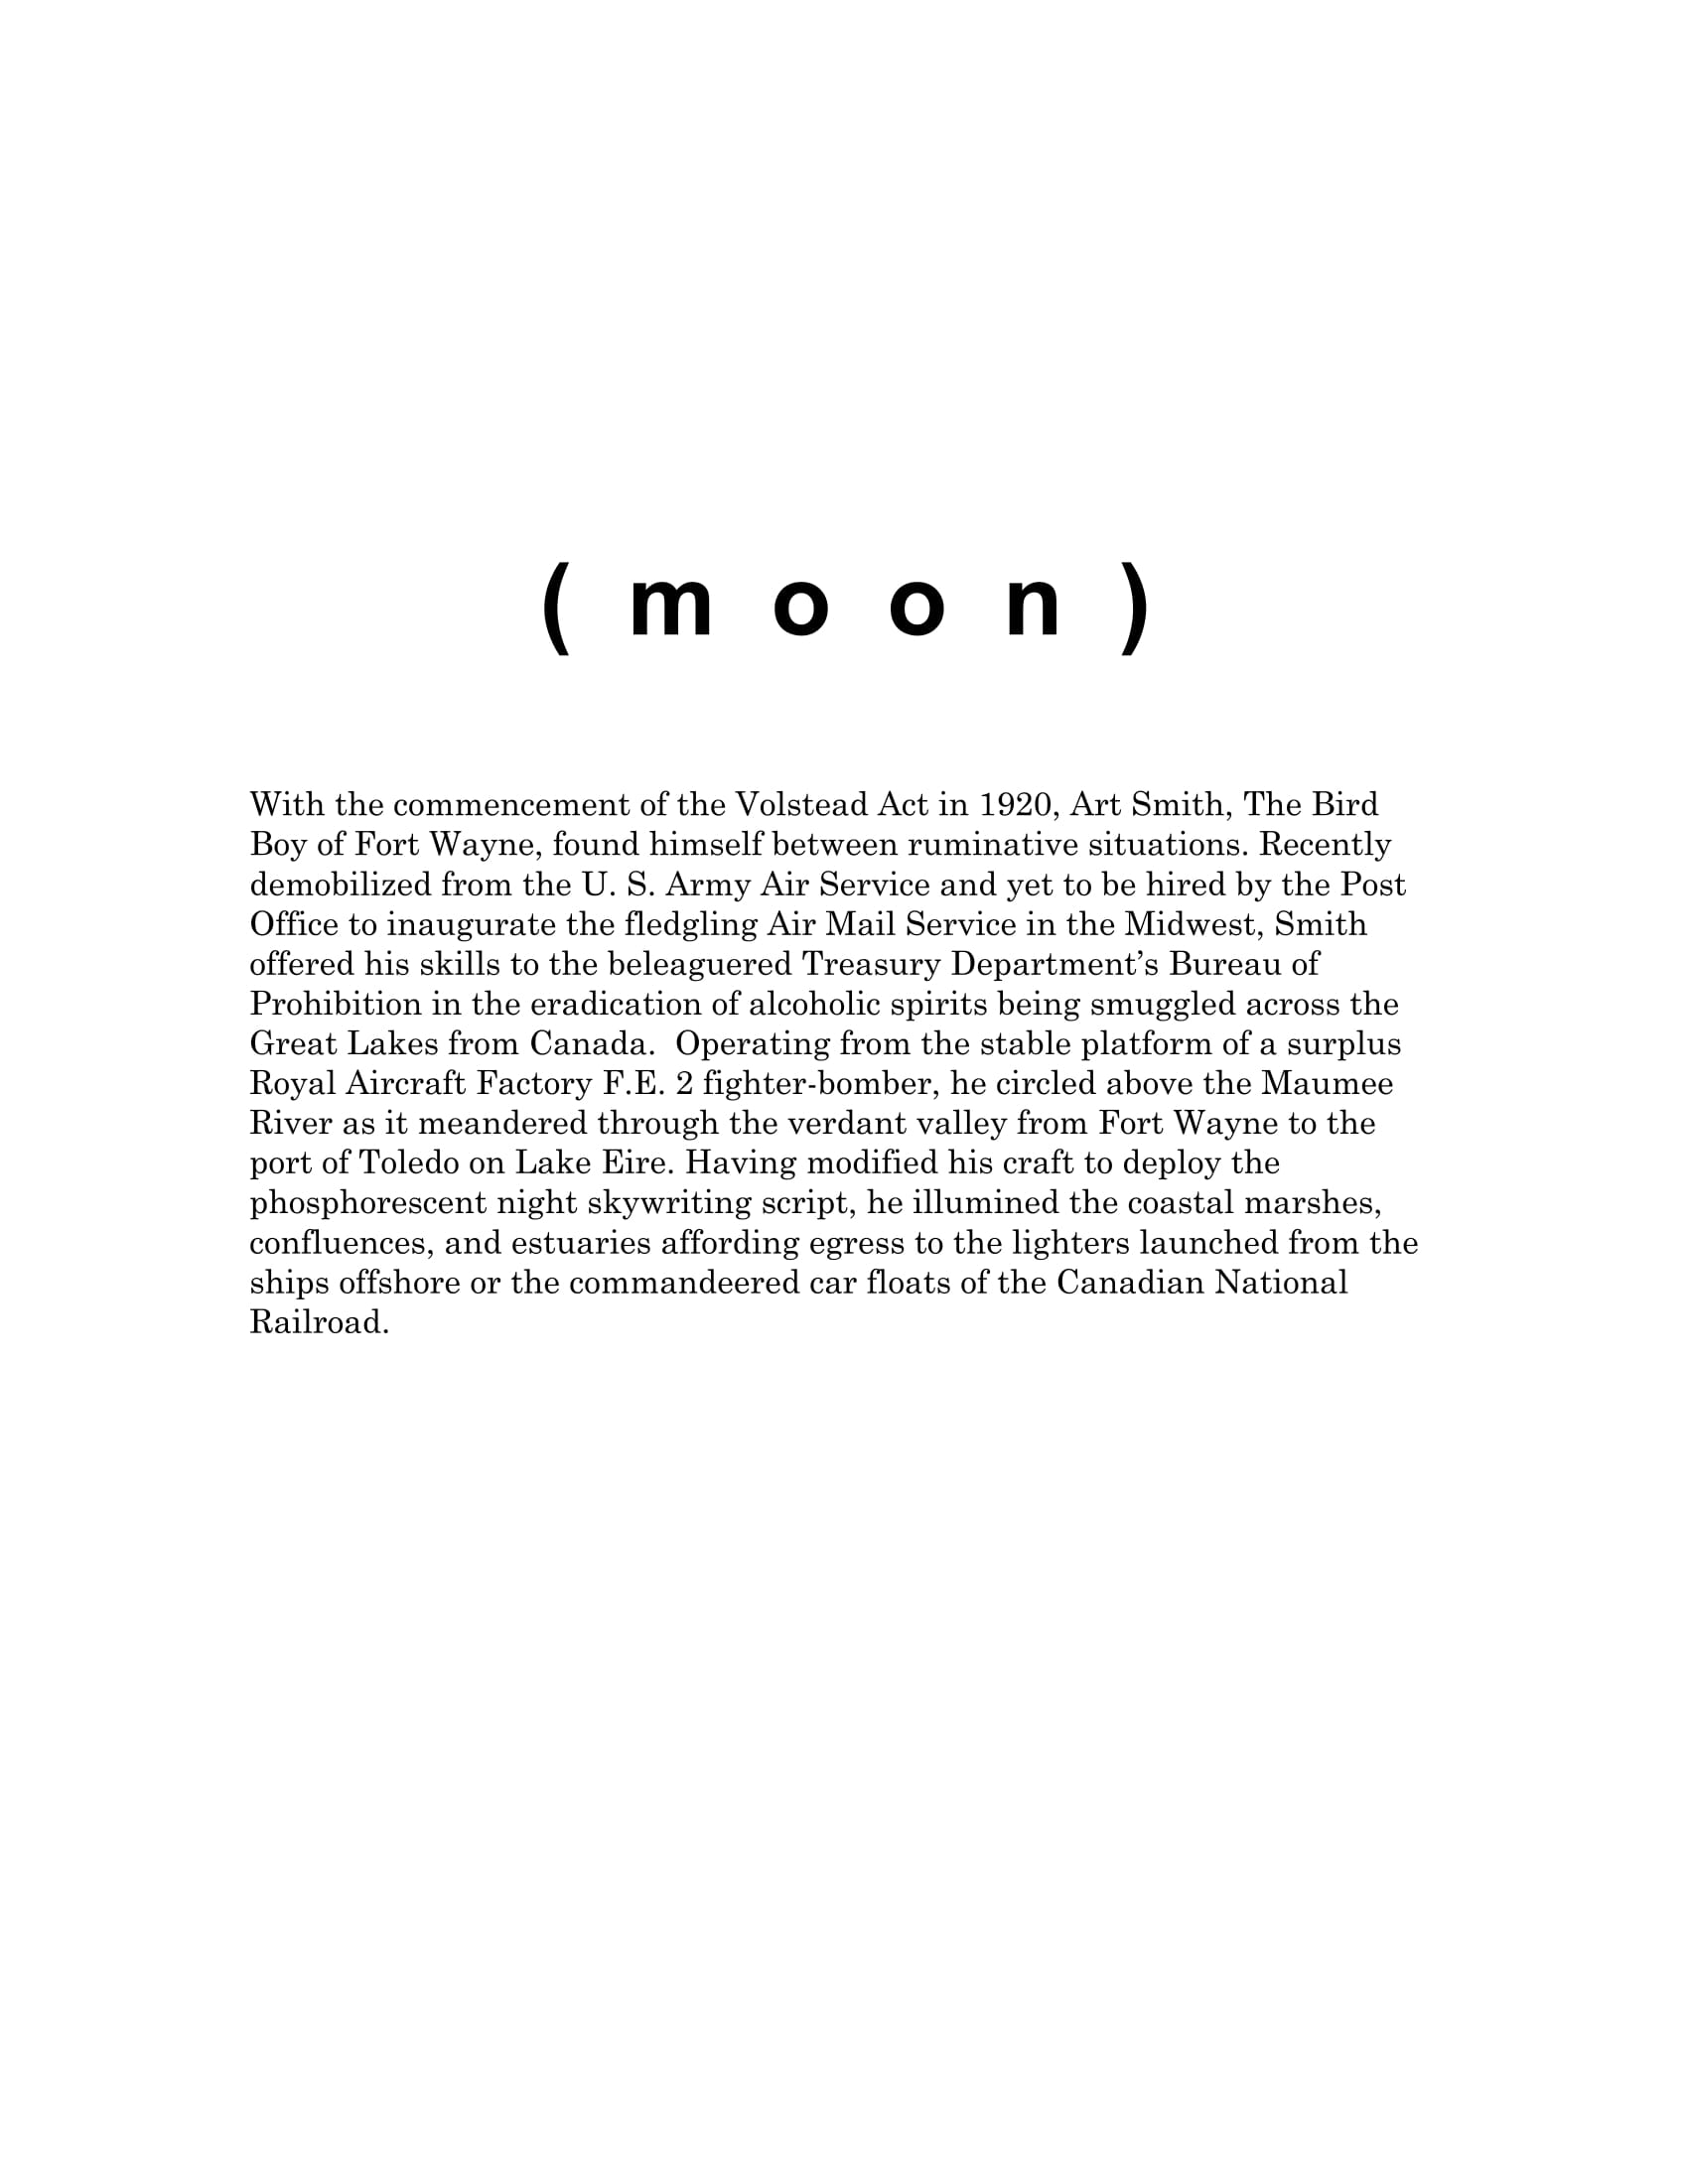 moon-new-1.jpg